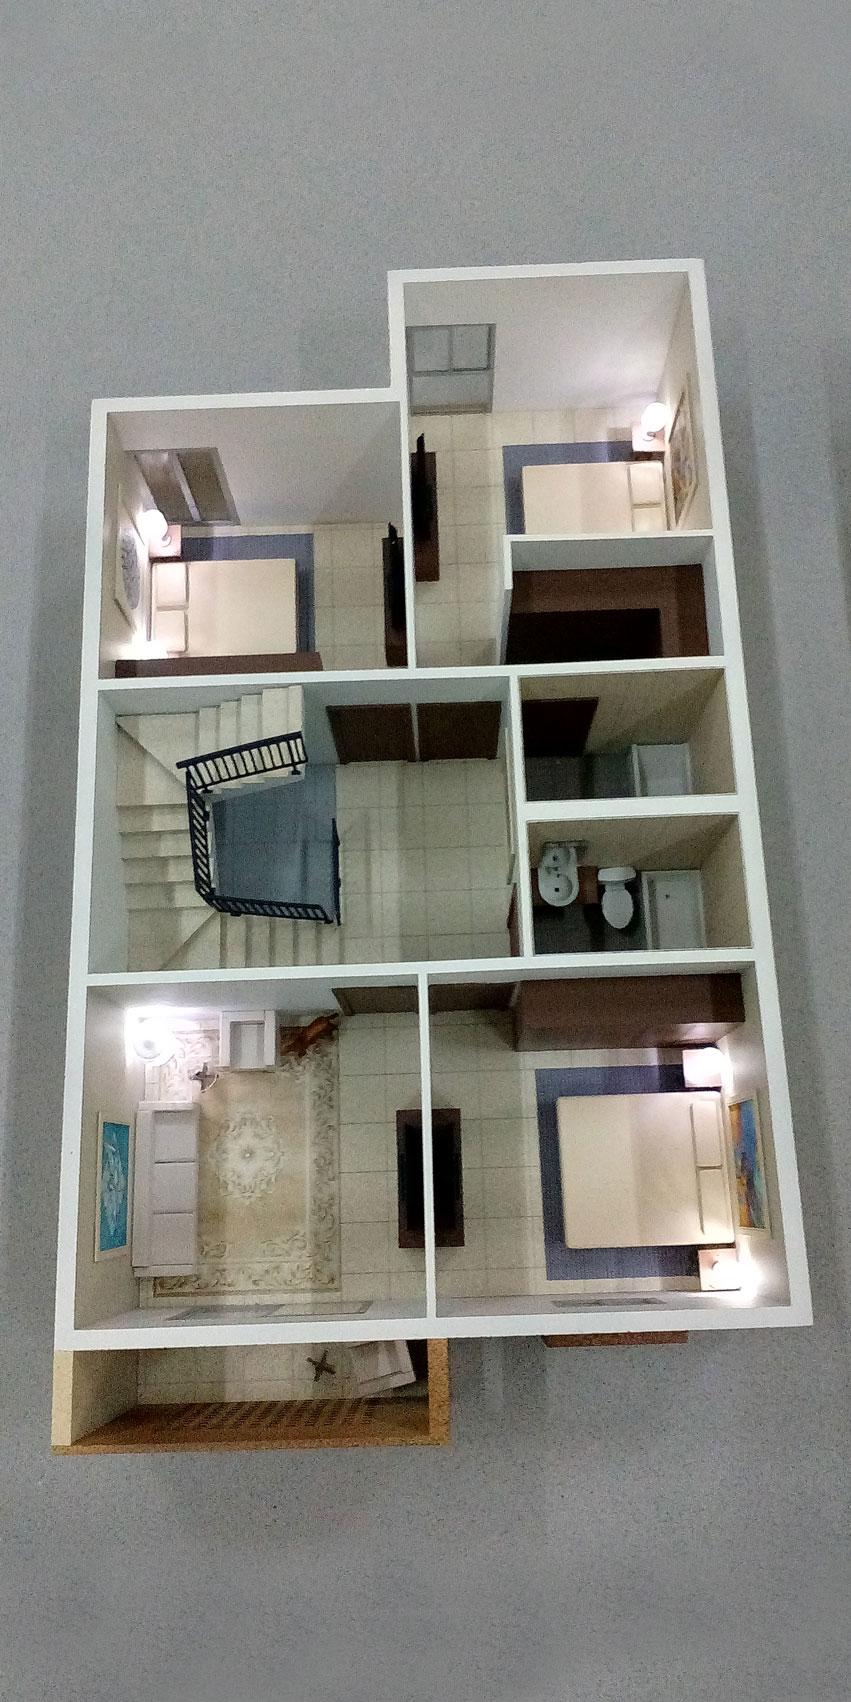 Scale Model - Architectural - Villas - Villa type 2, first floor - UAE